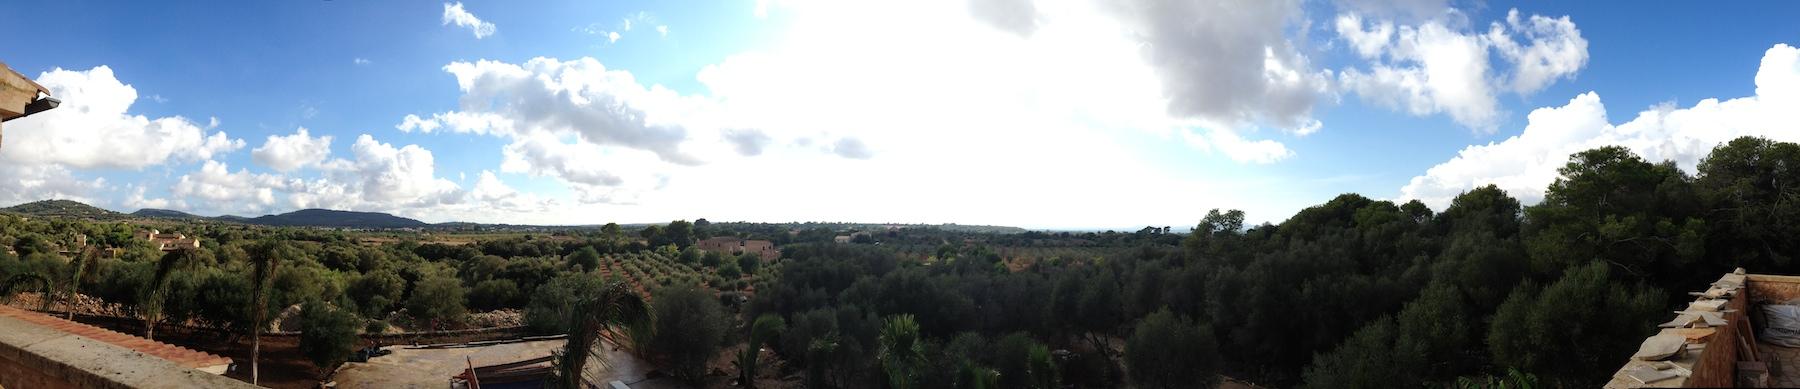 Himmel in Mallorca